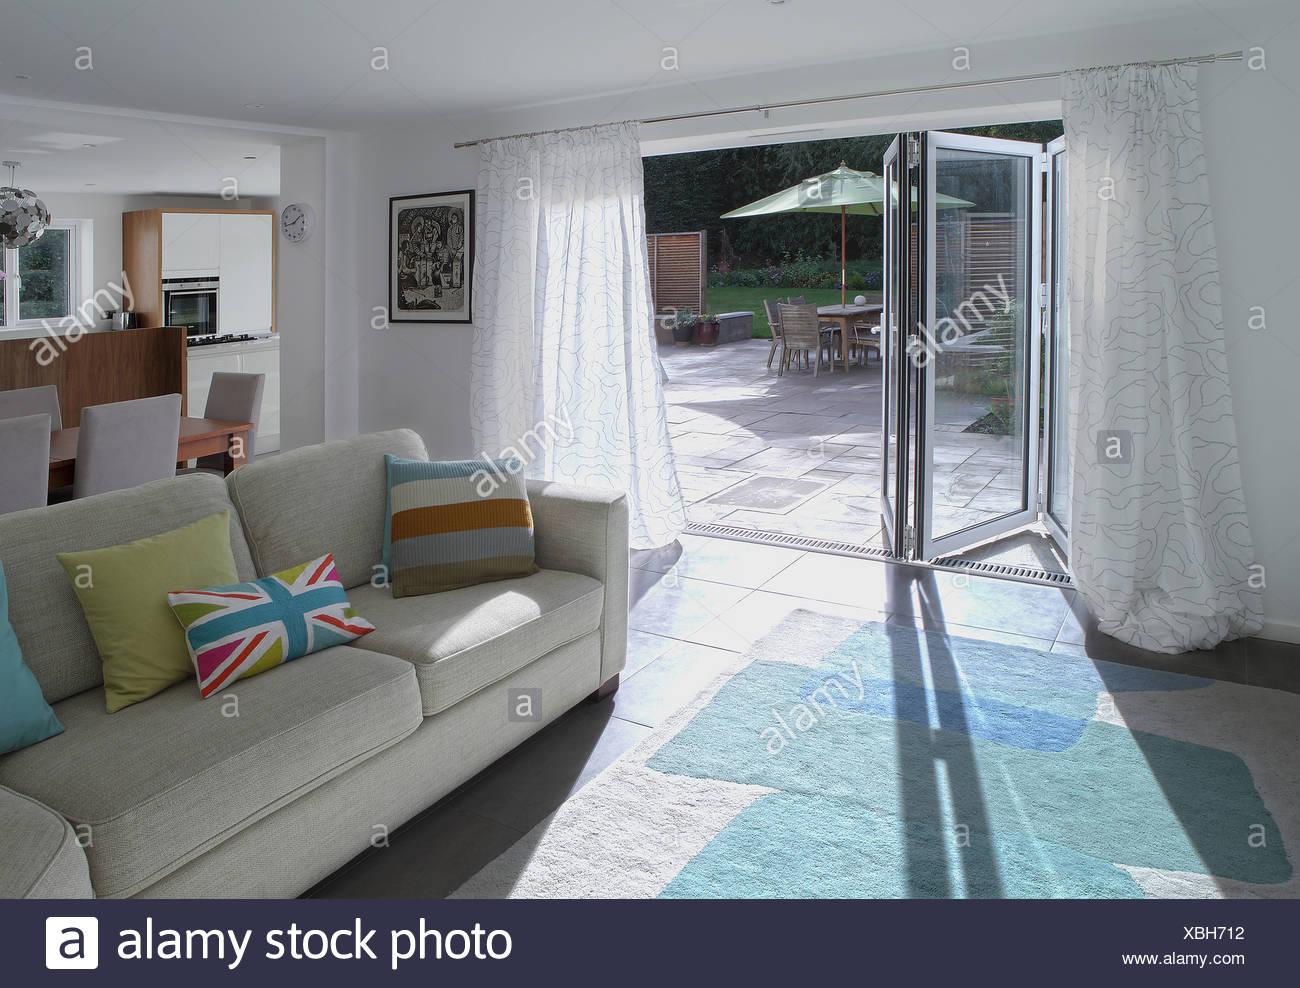 Open plan living area with open patio doors - Stock Image